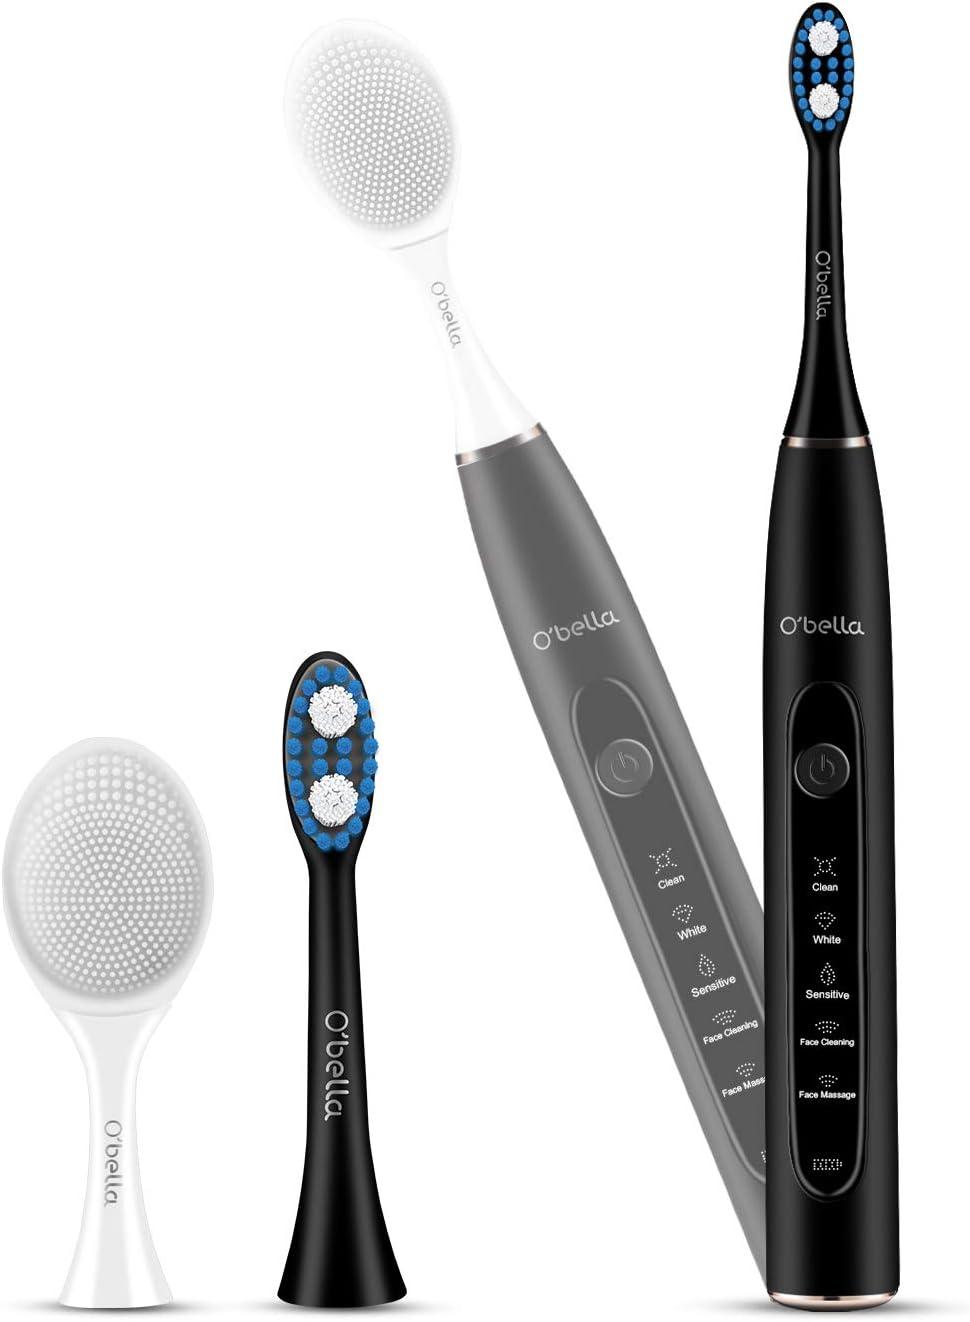 Obella RM-T10 Limpiador Facial & Cepillo Eléctrico Dientes Sónico ...